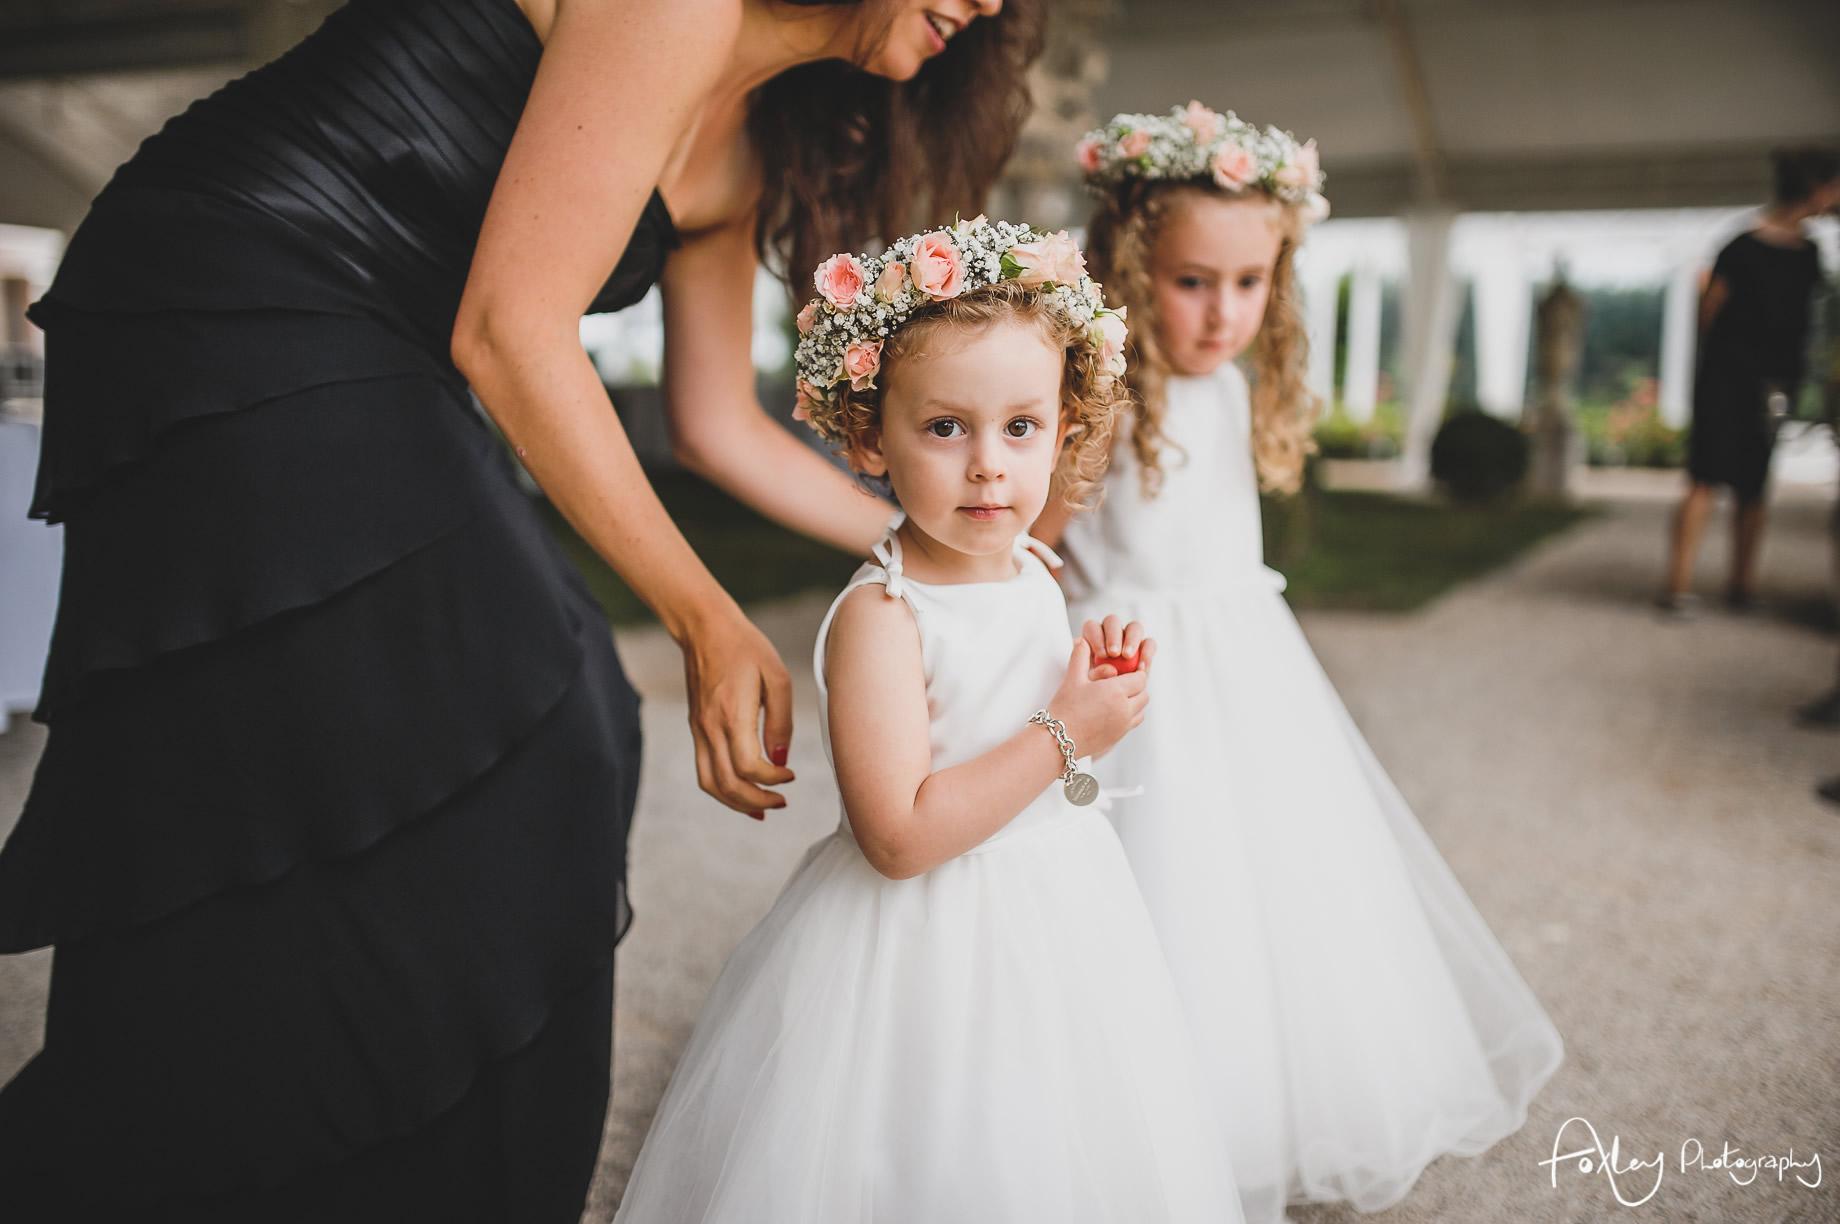 Jil and Will's Wedding at Villa Ephrussi De Rothschild 085